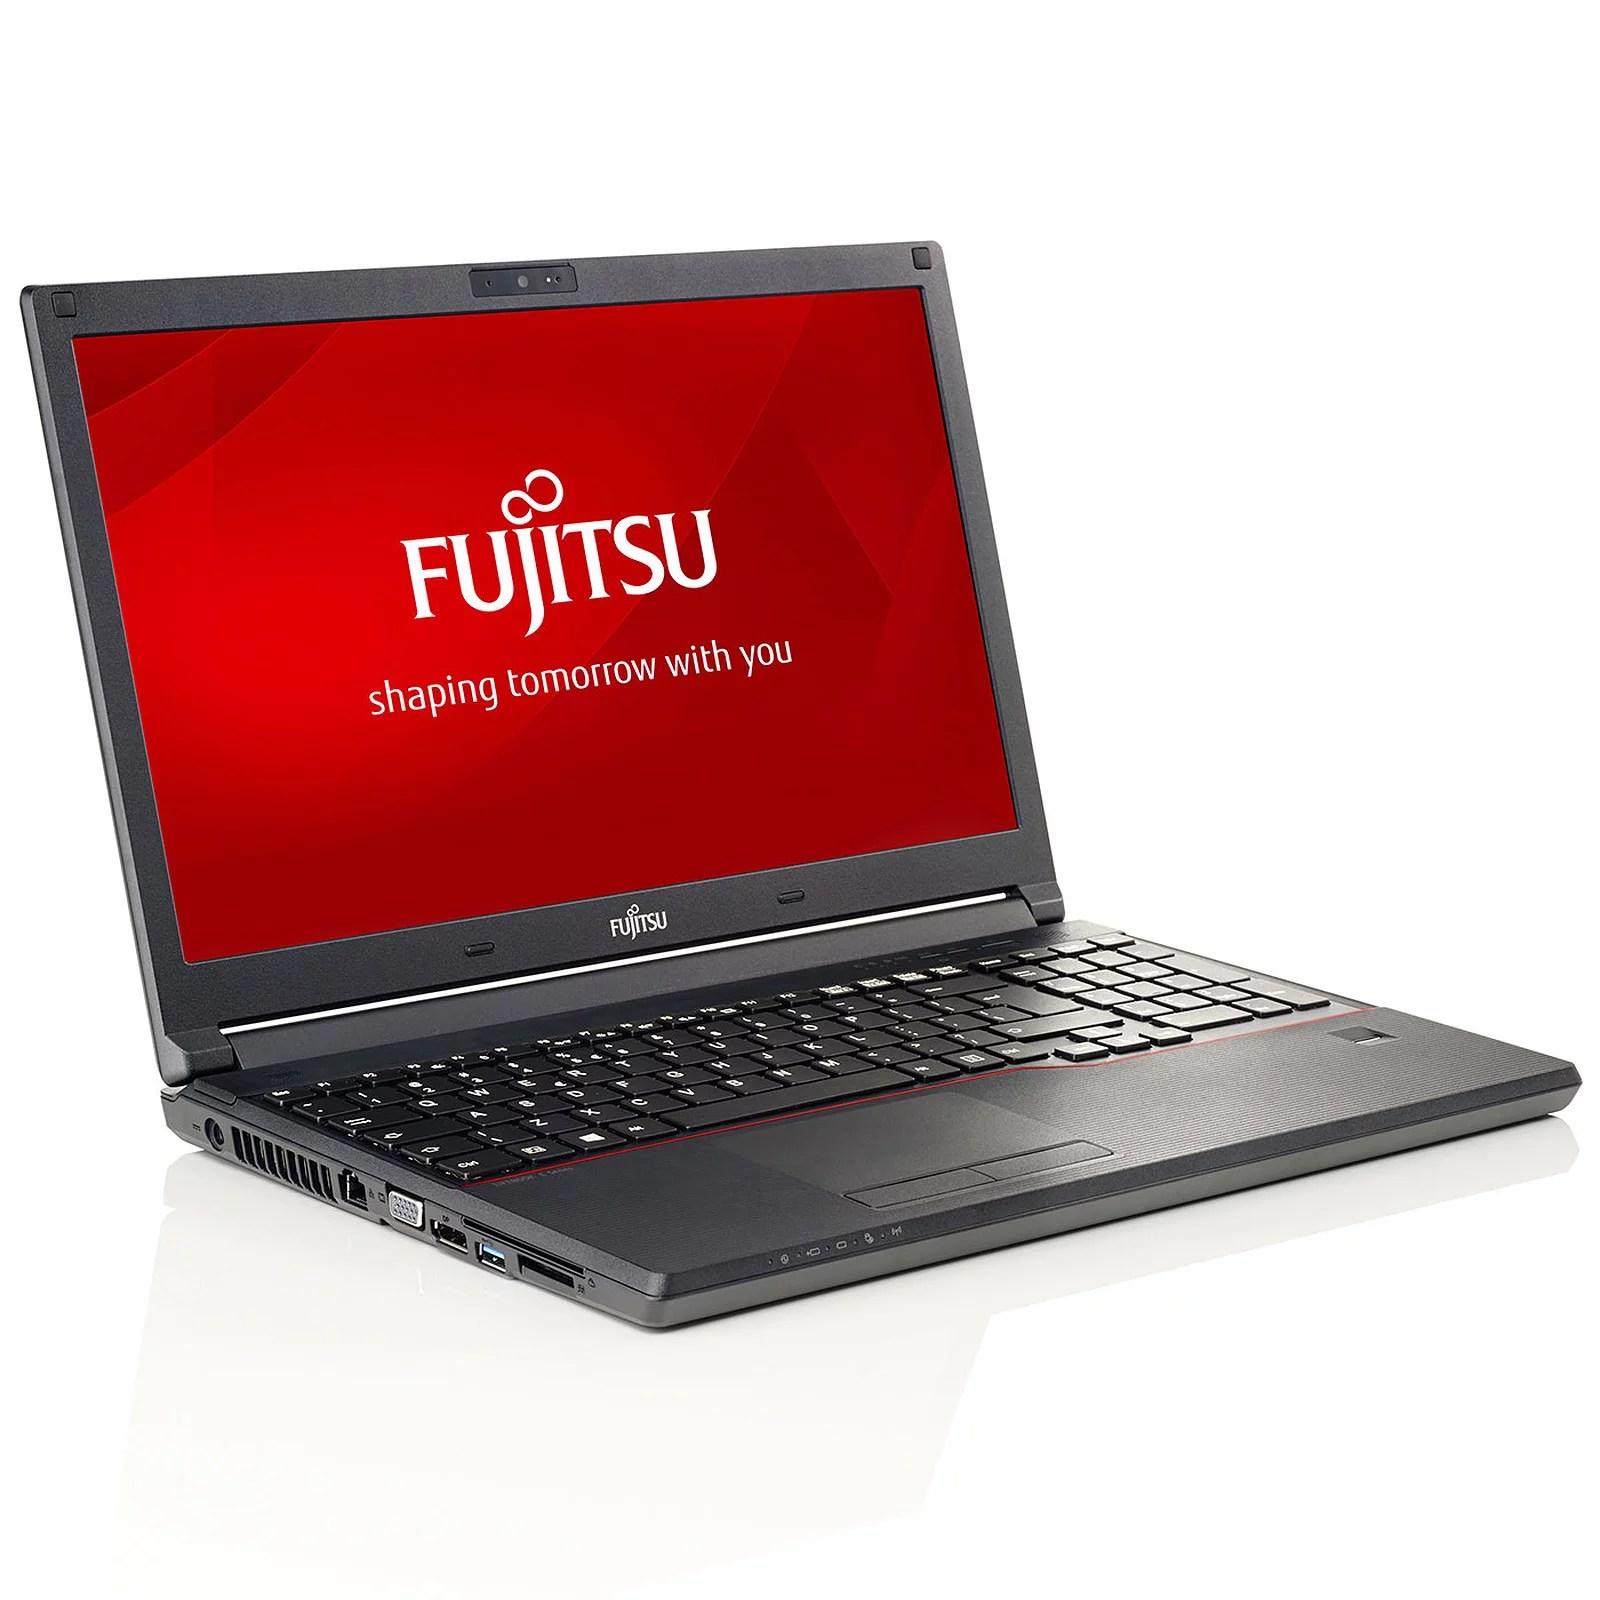 Fujitsu_E554